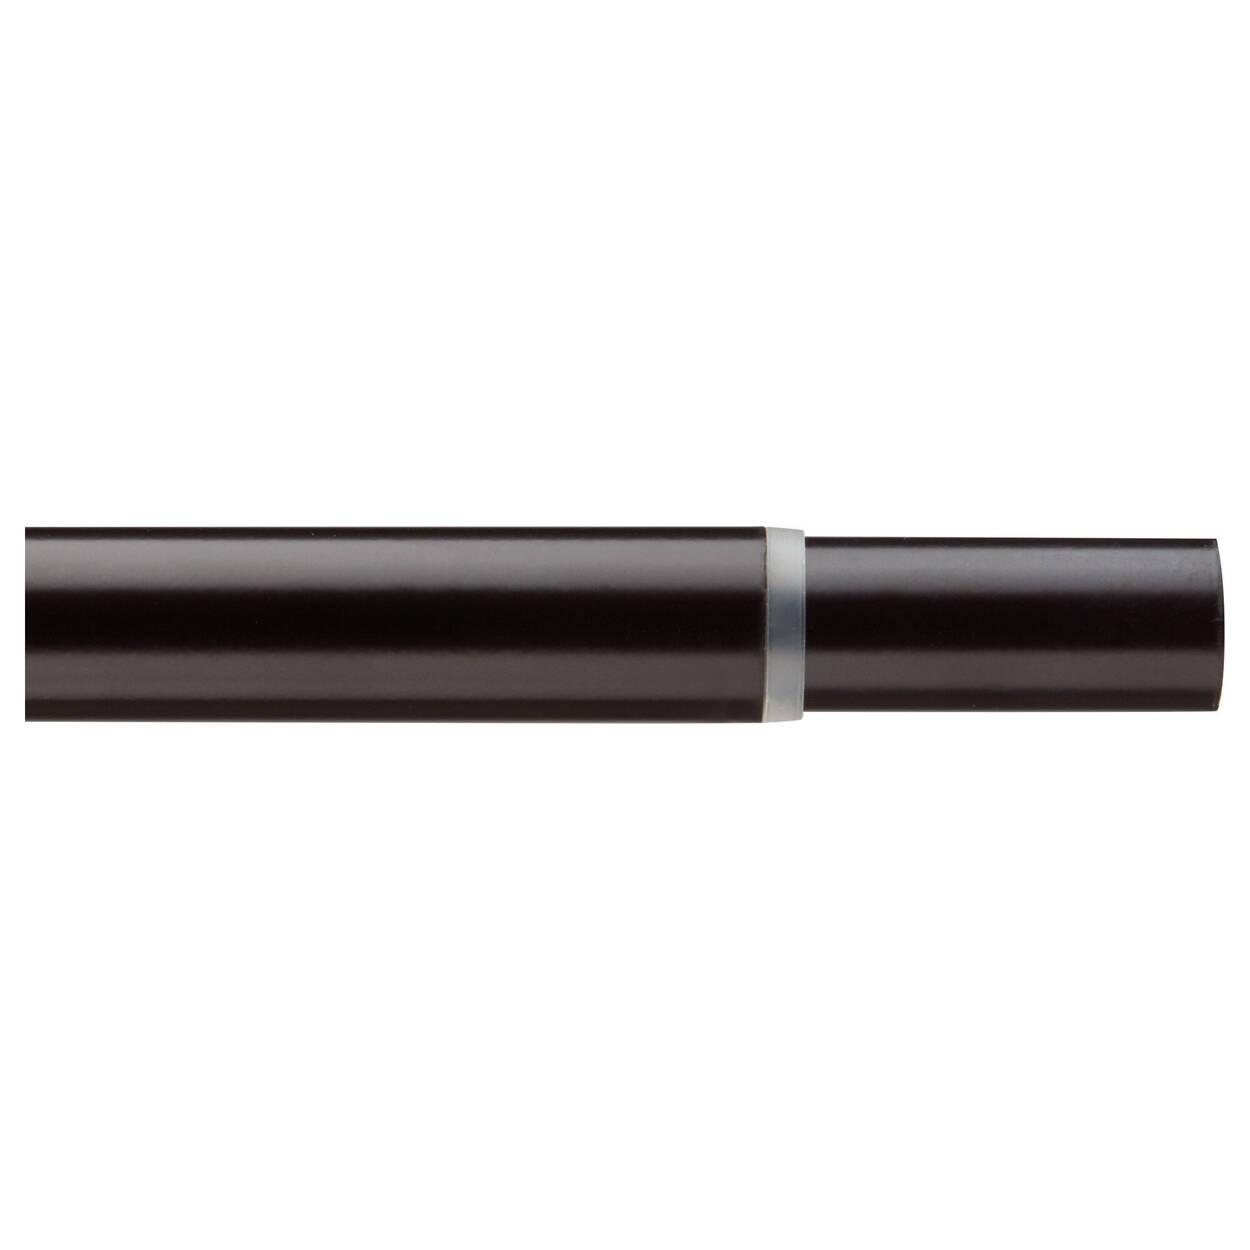 Extension Rod Set - Diameter 16 mm